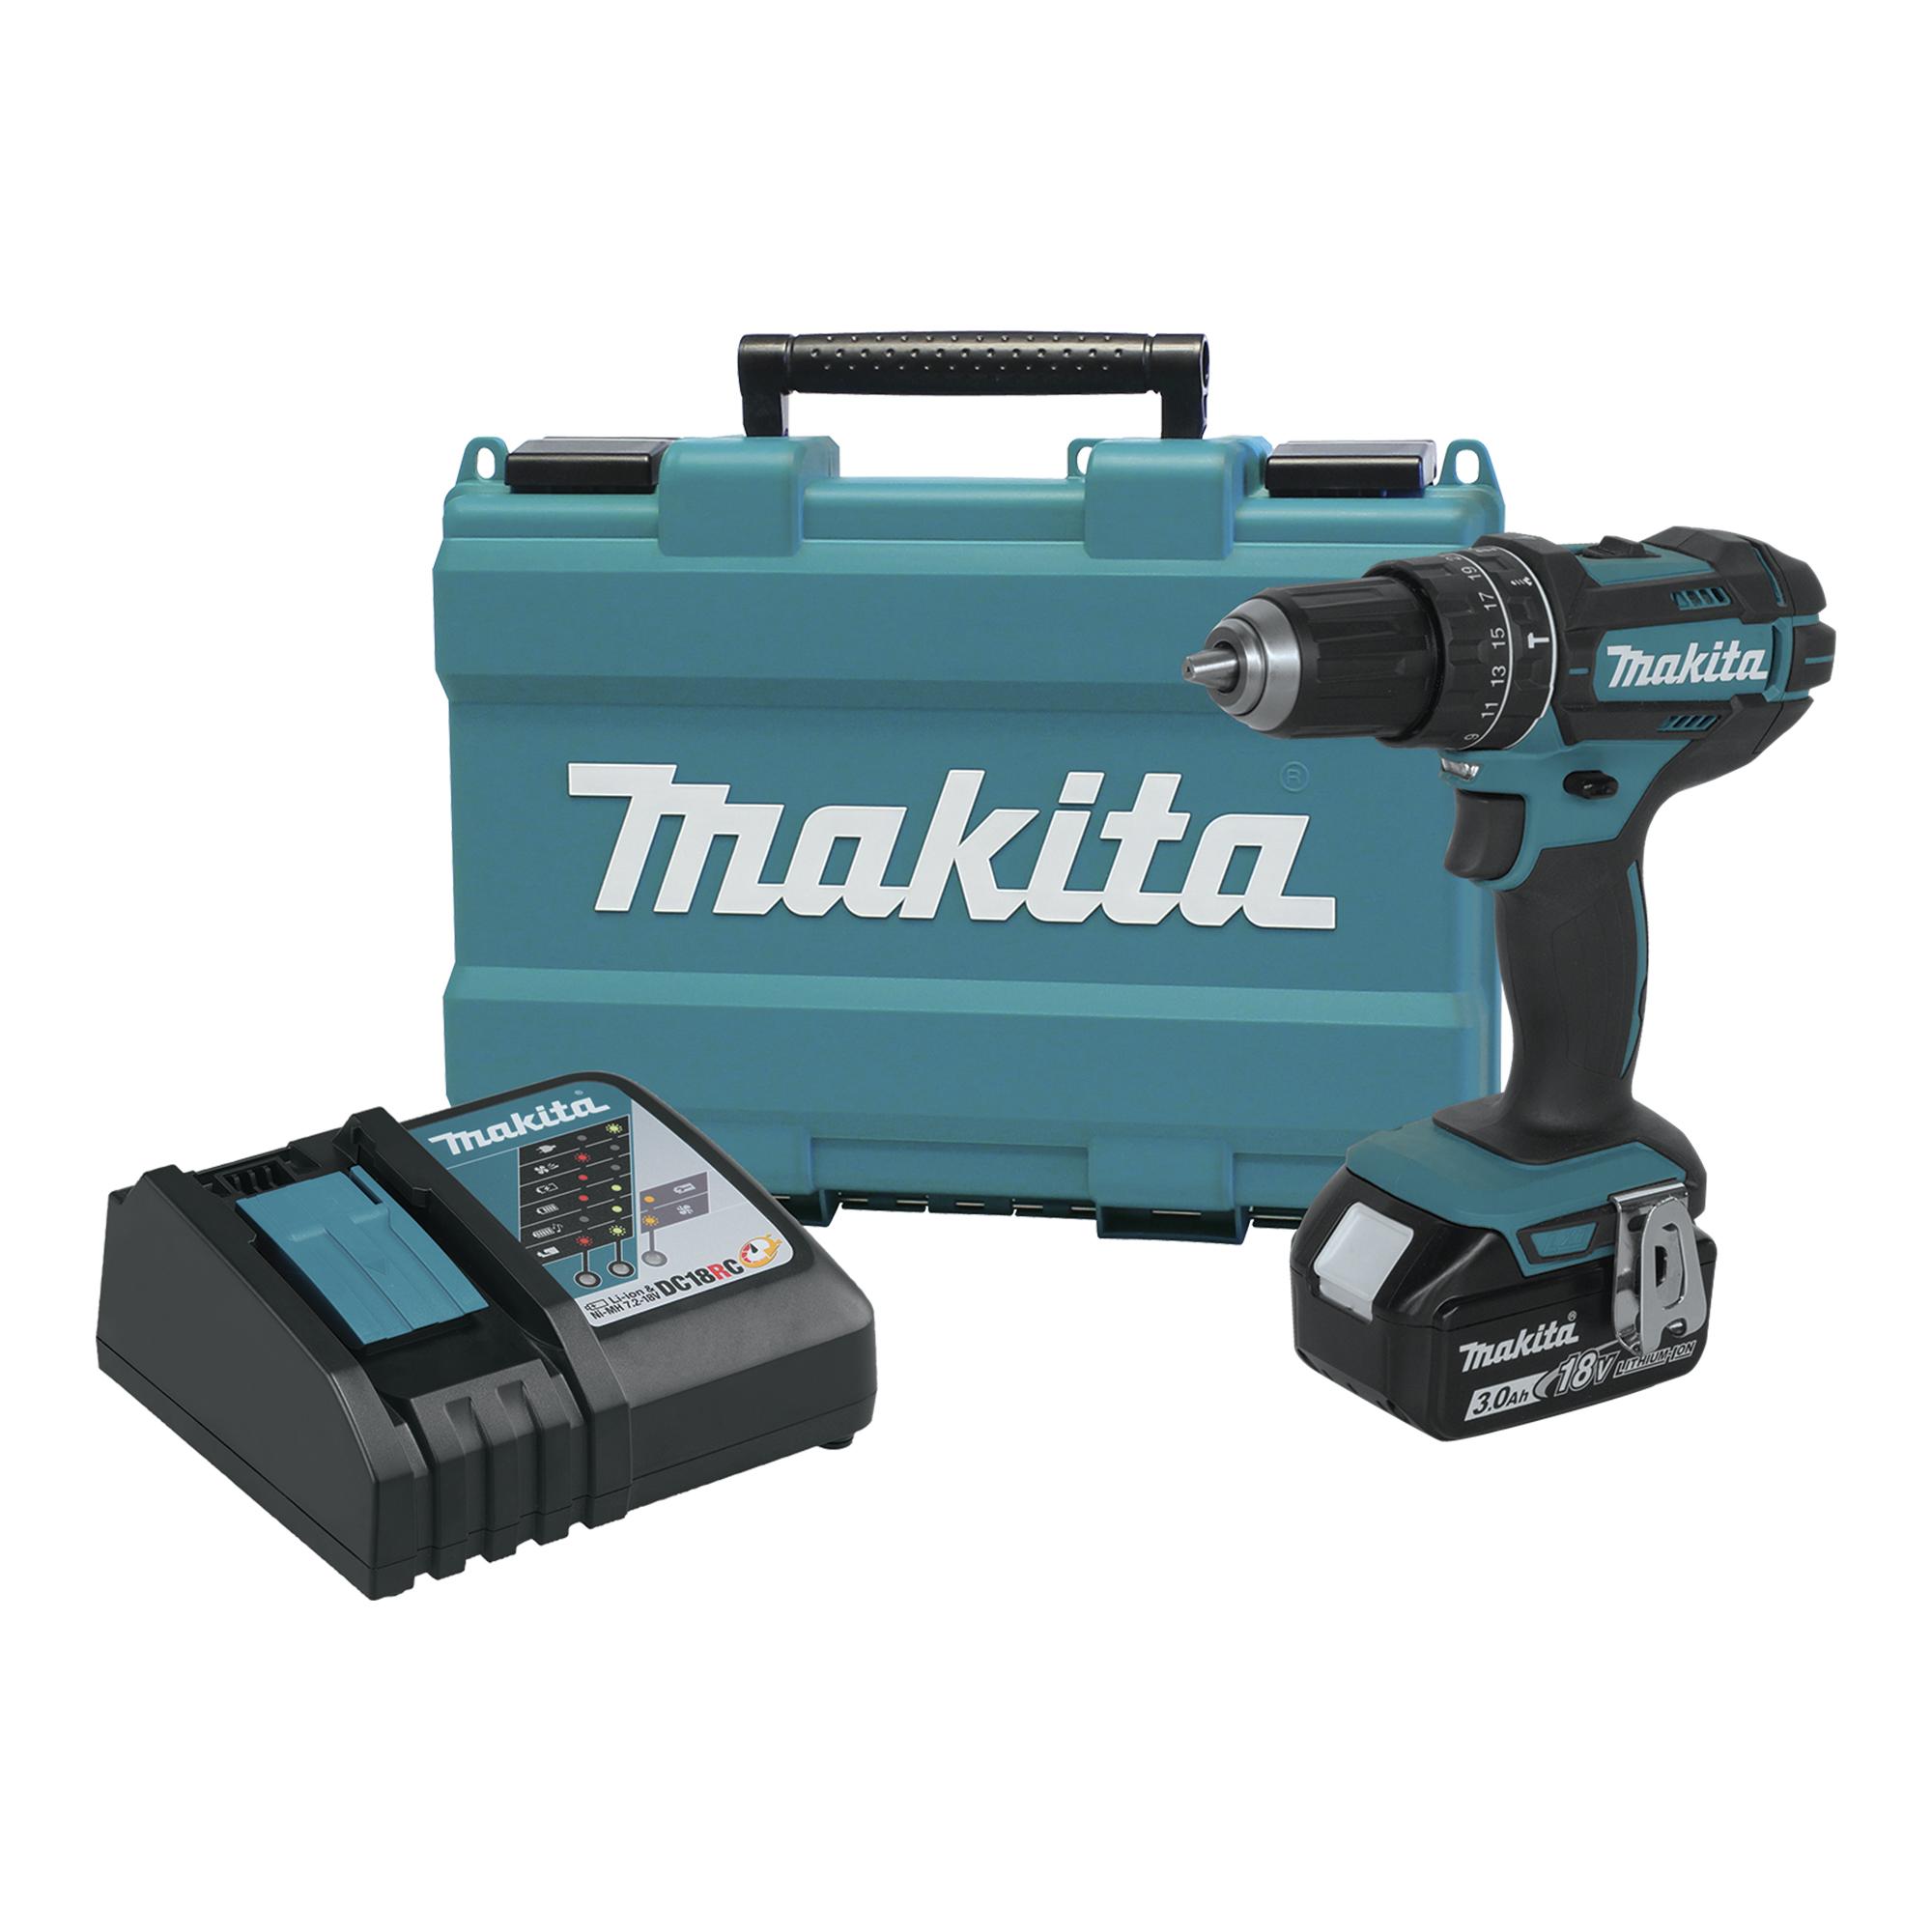 Makita 18v 3 0ah Lxt Lithium Ion Cordless 0 5 Quot Hammer Driver Drill Kit Xph102 Ebay